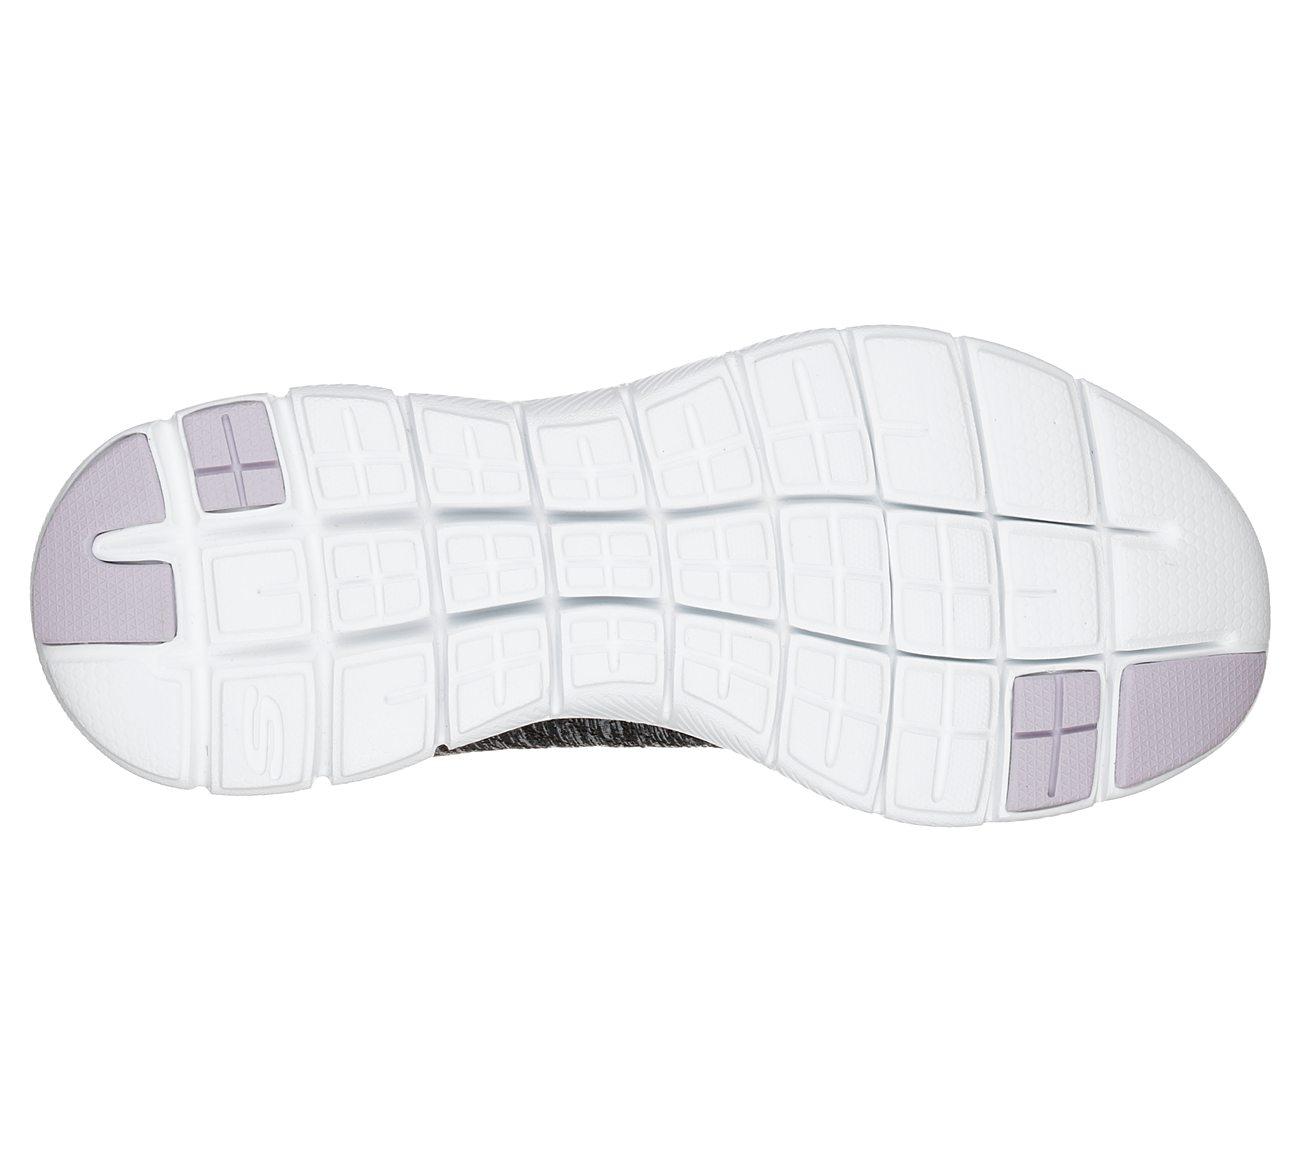 ef4732a43251 Buy SKECHERS Flex Appeal 2.0 Flex Appeal Shoes only  90.00